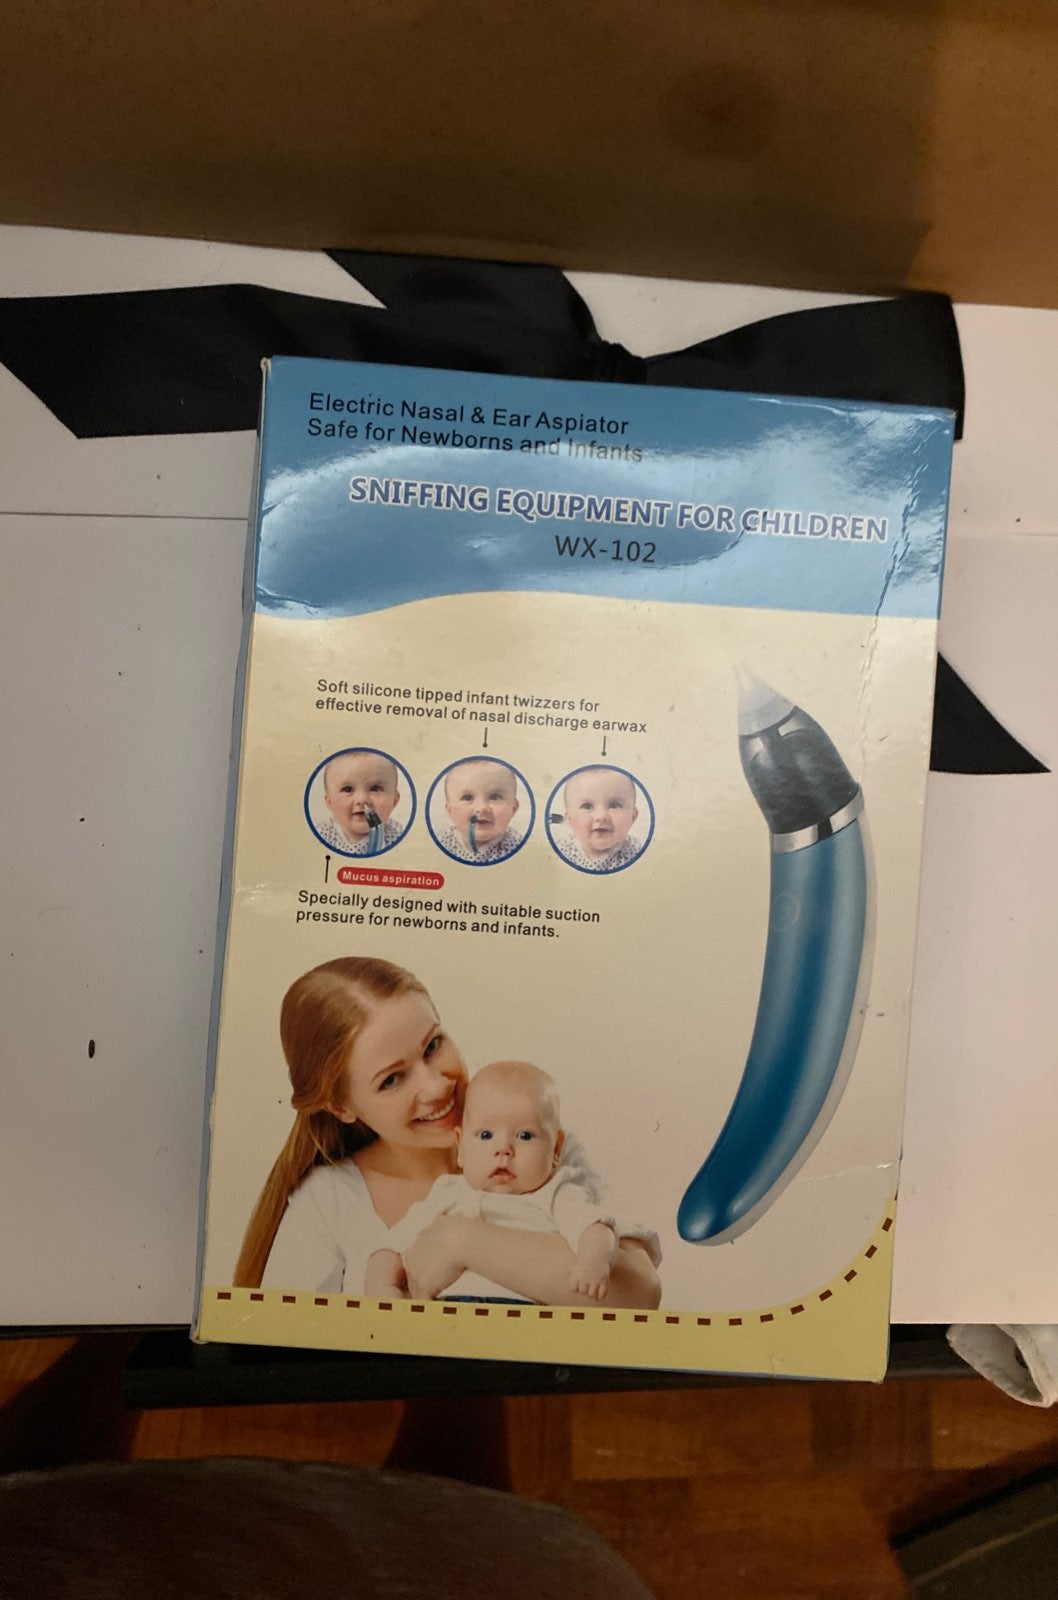 Electric nasal and ear respirator